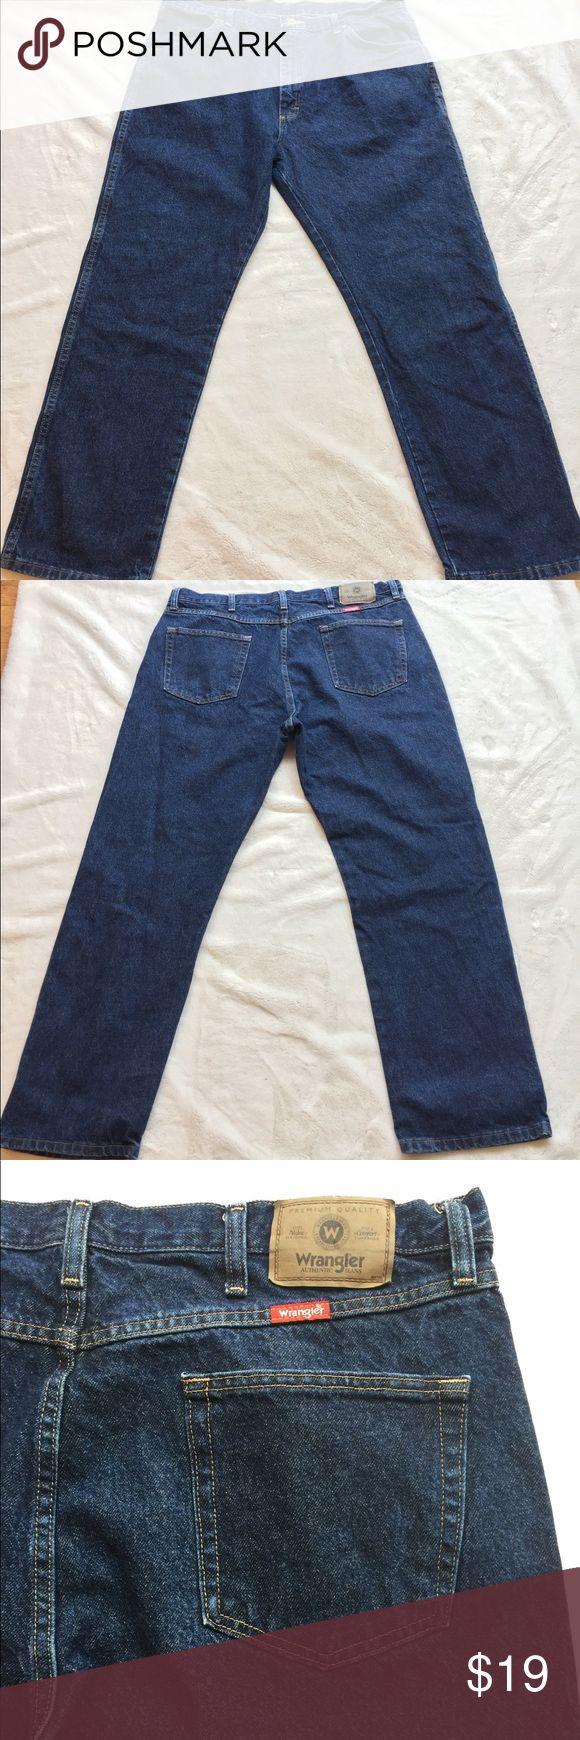 Wrangler jeans regular fit. 40/30 Great preworn condition.  Medium wash. Please enlarge photos for close up of jeans for any blemishes. Wrangler Jeans Straight